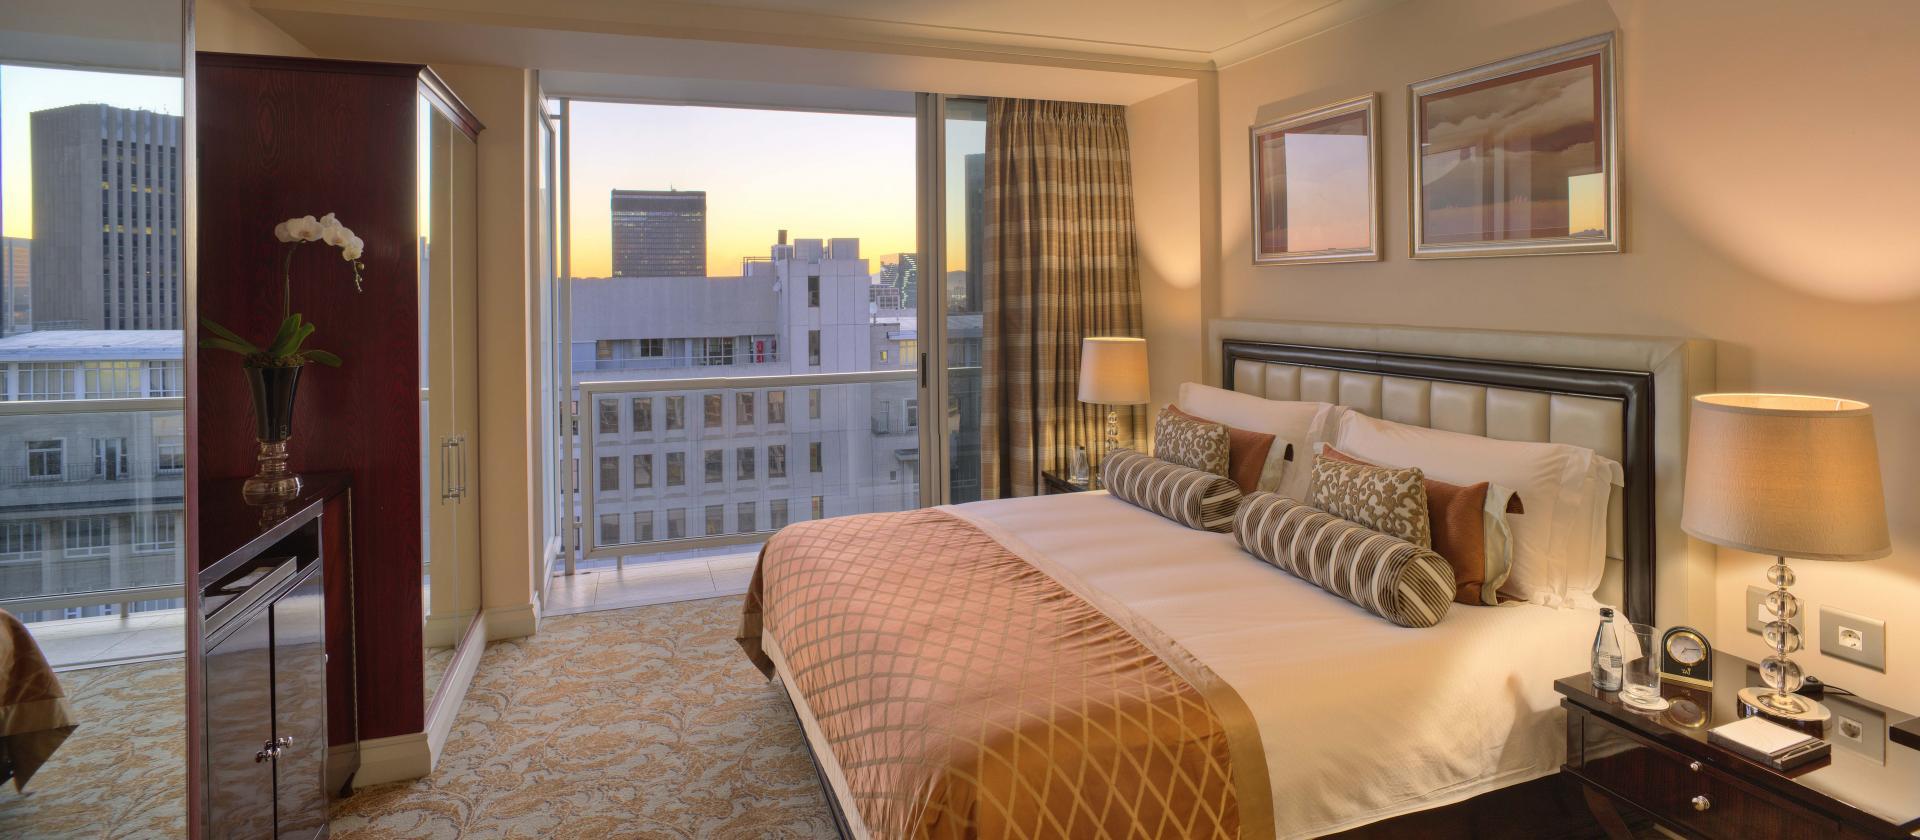 Master Bedroom at Taj Cape Town, Centre, Cape Town - Citybase Apartments